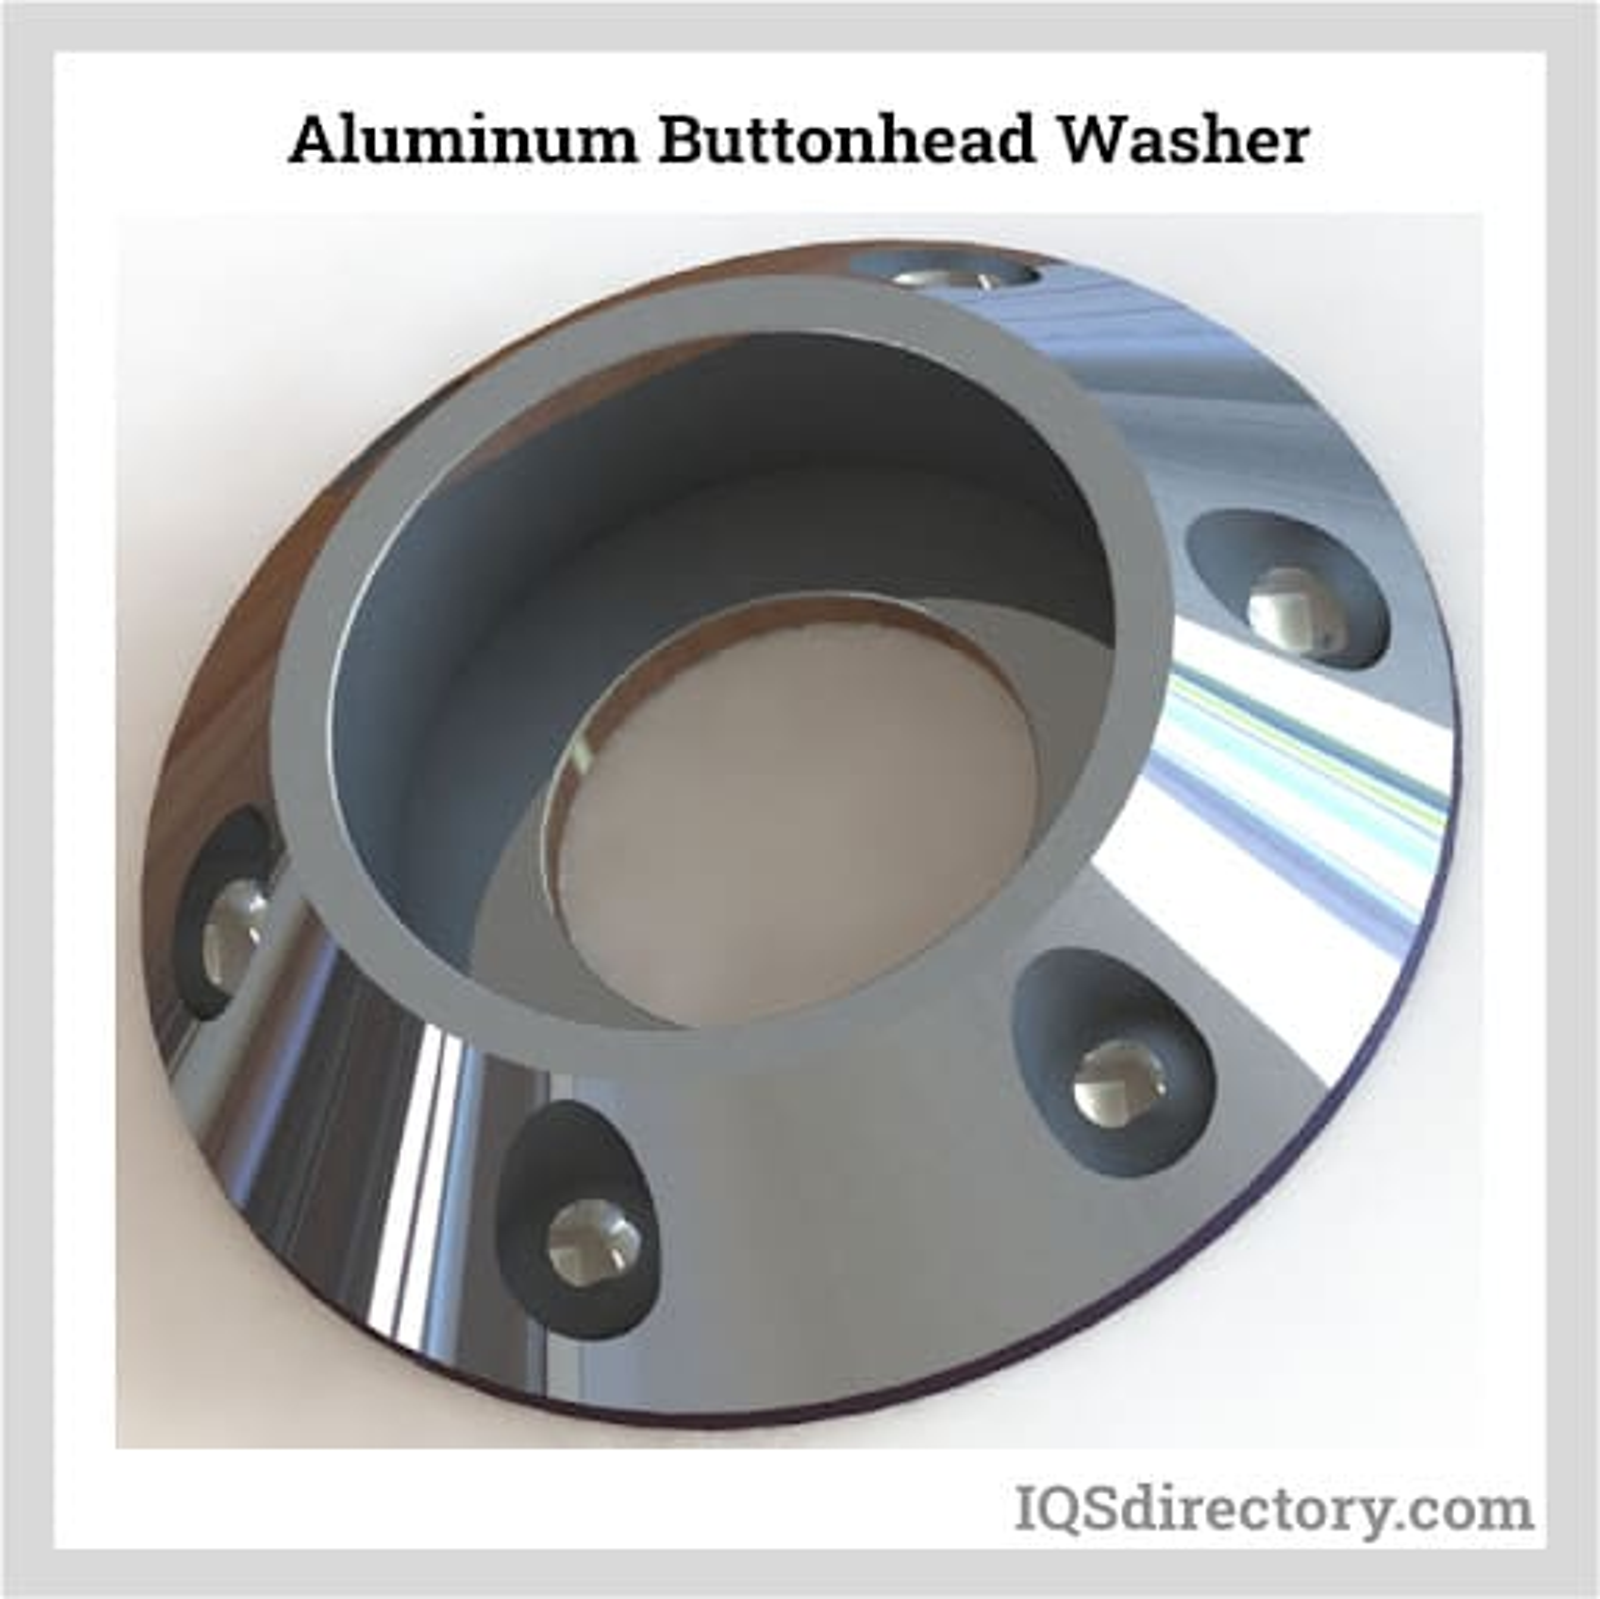 Aluminum Buttonhead Washer